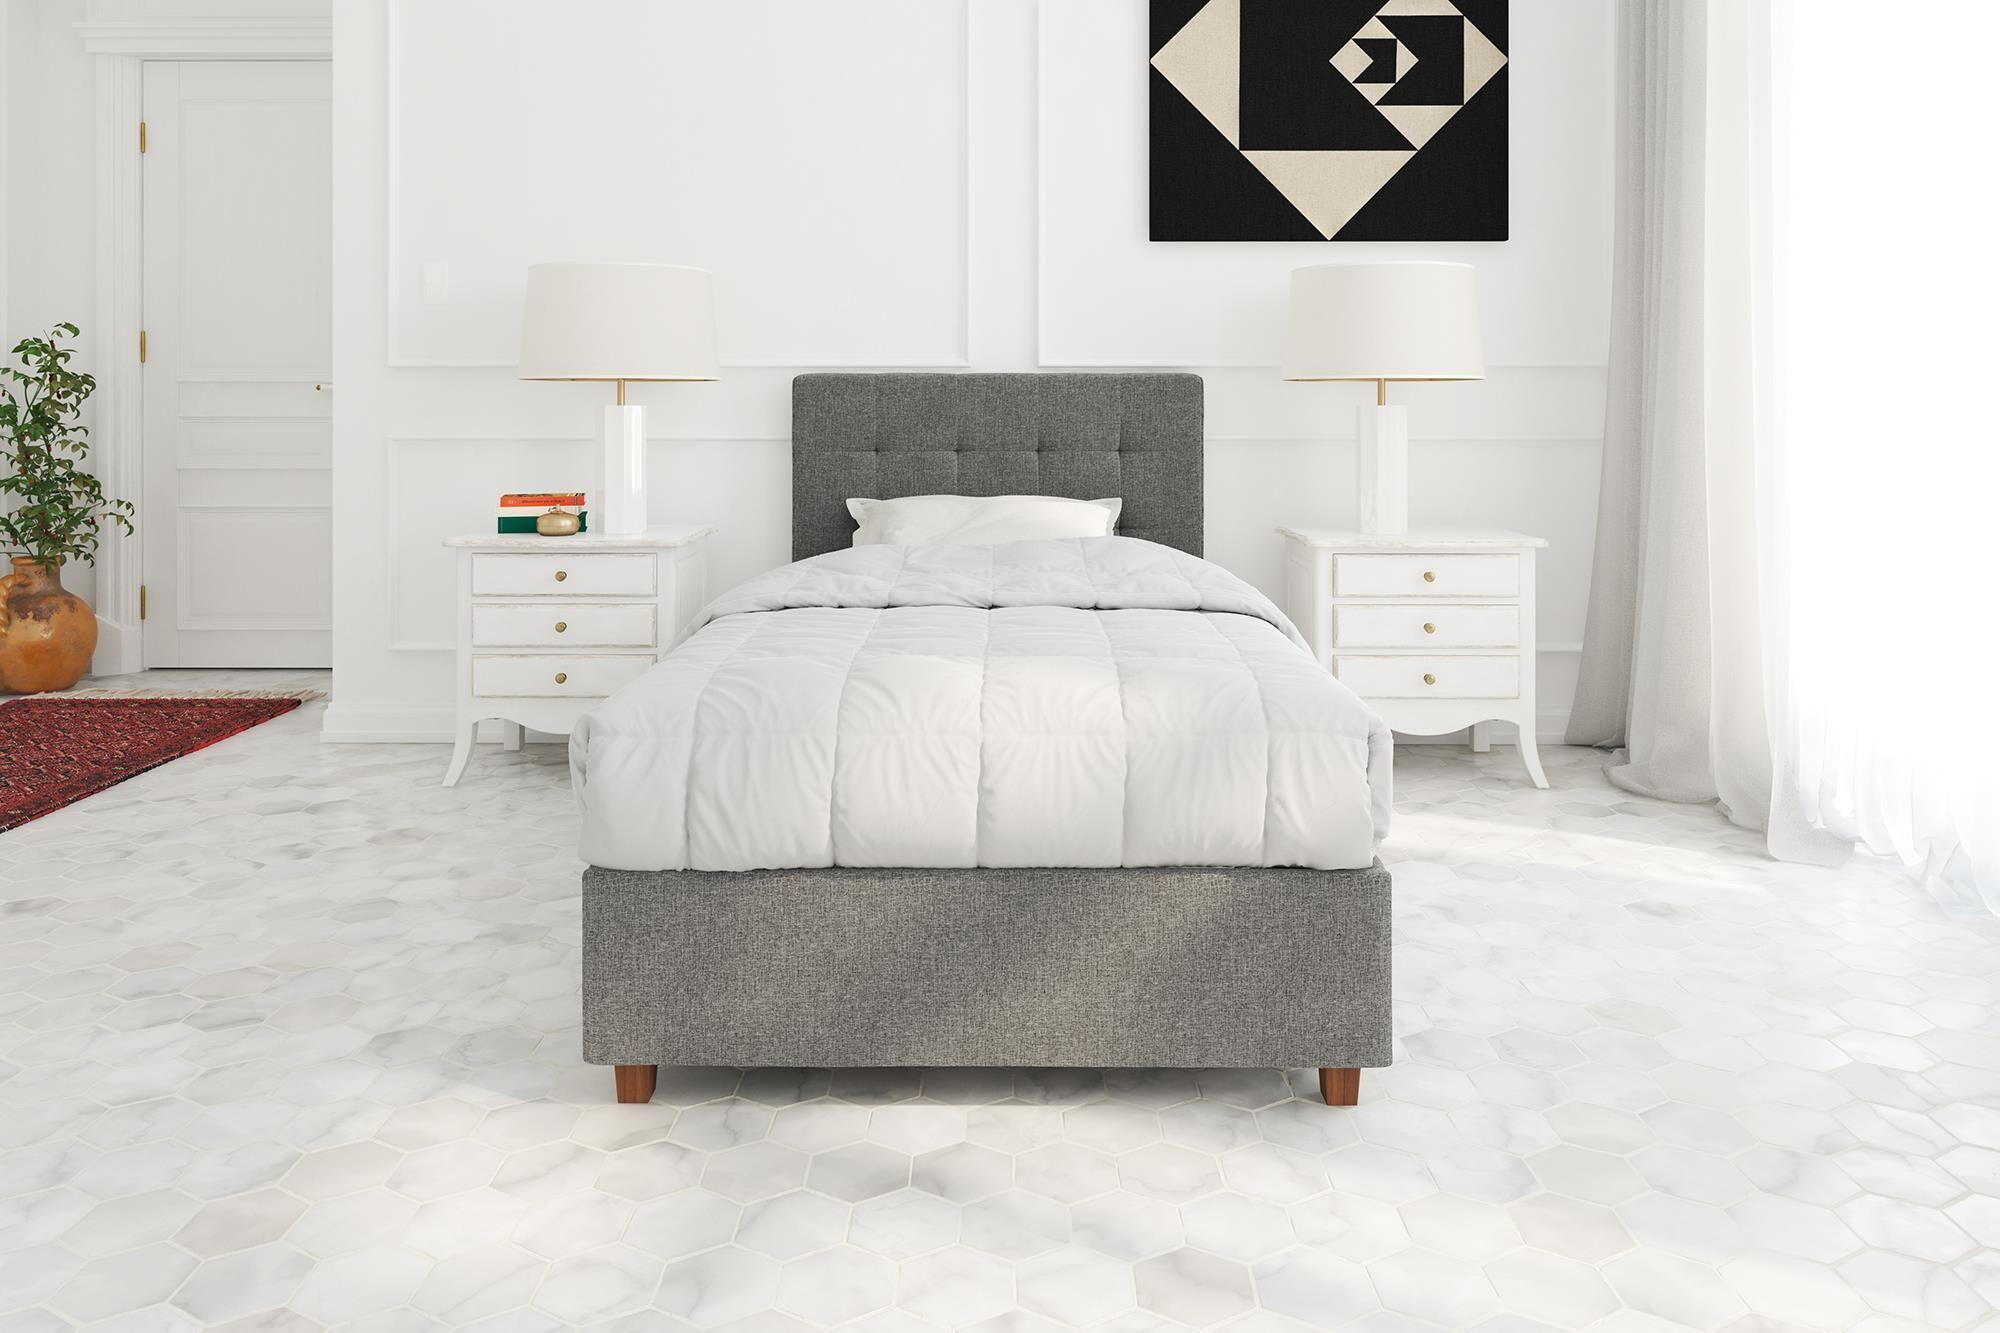 Huckstep Upholstered Platform Bed Size: Twin, Color: Gray